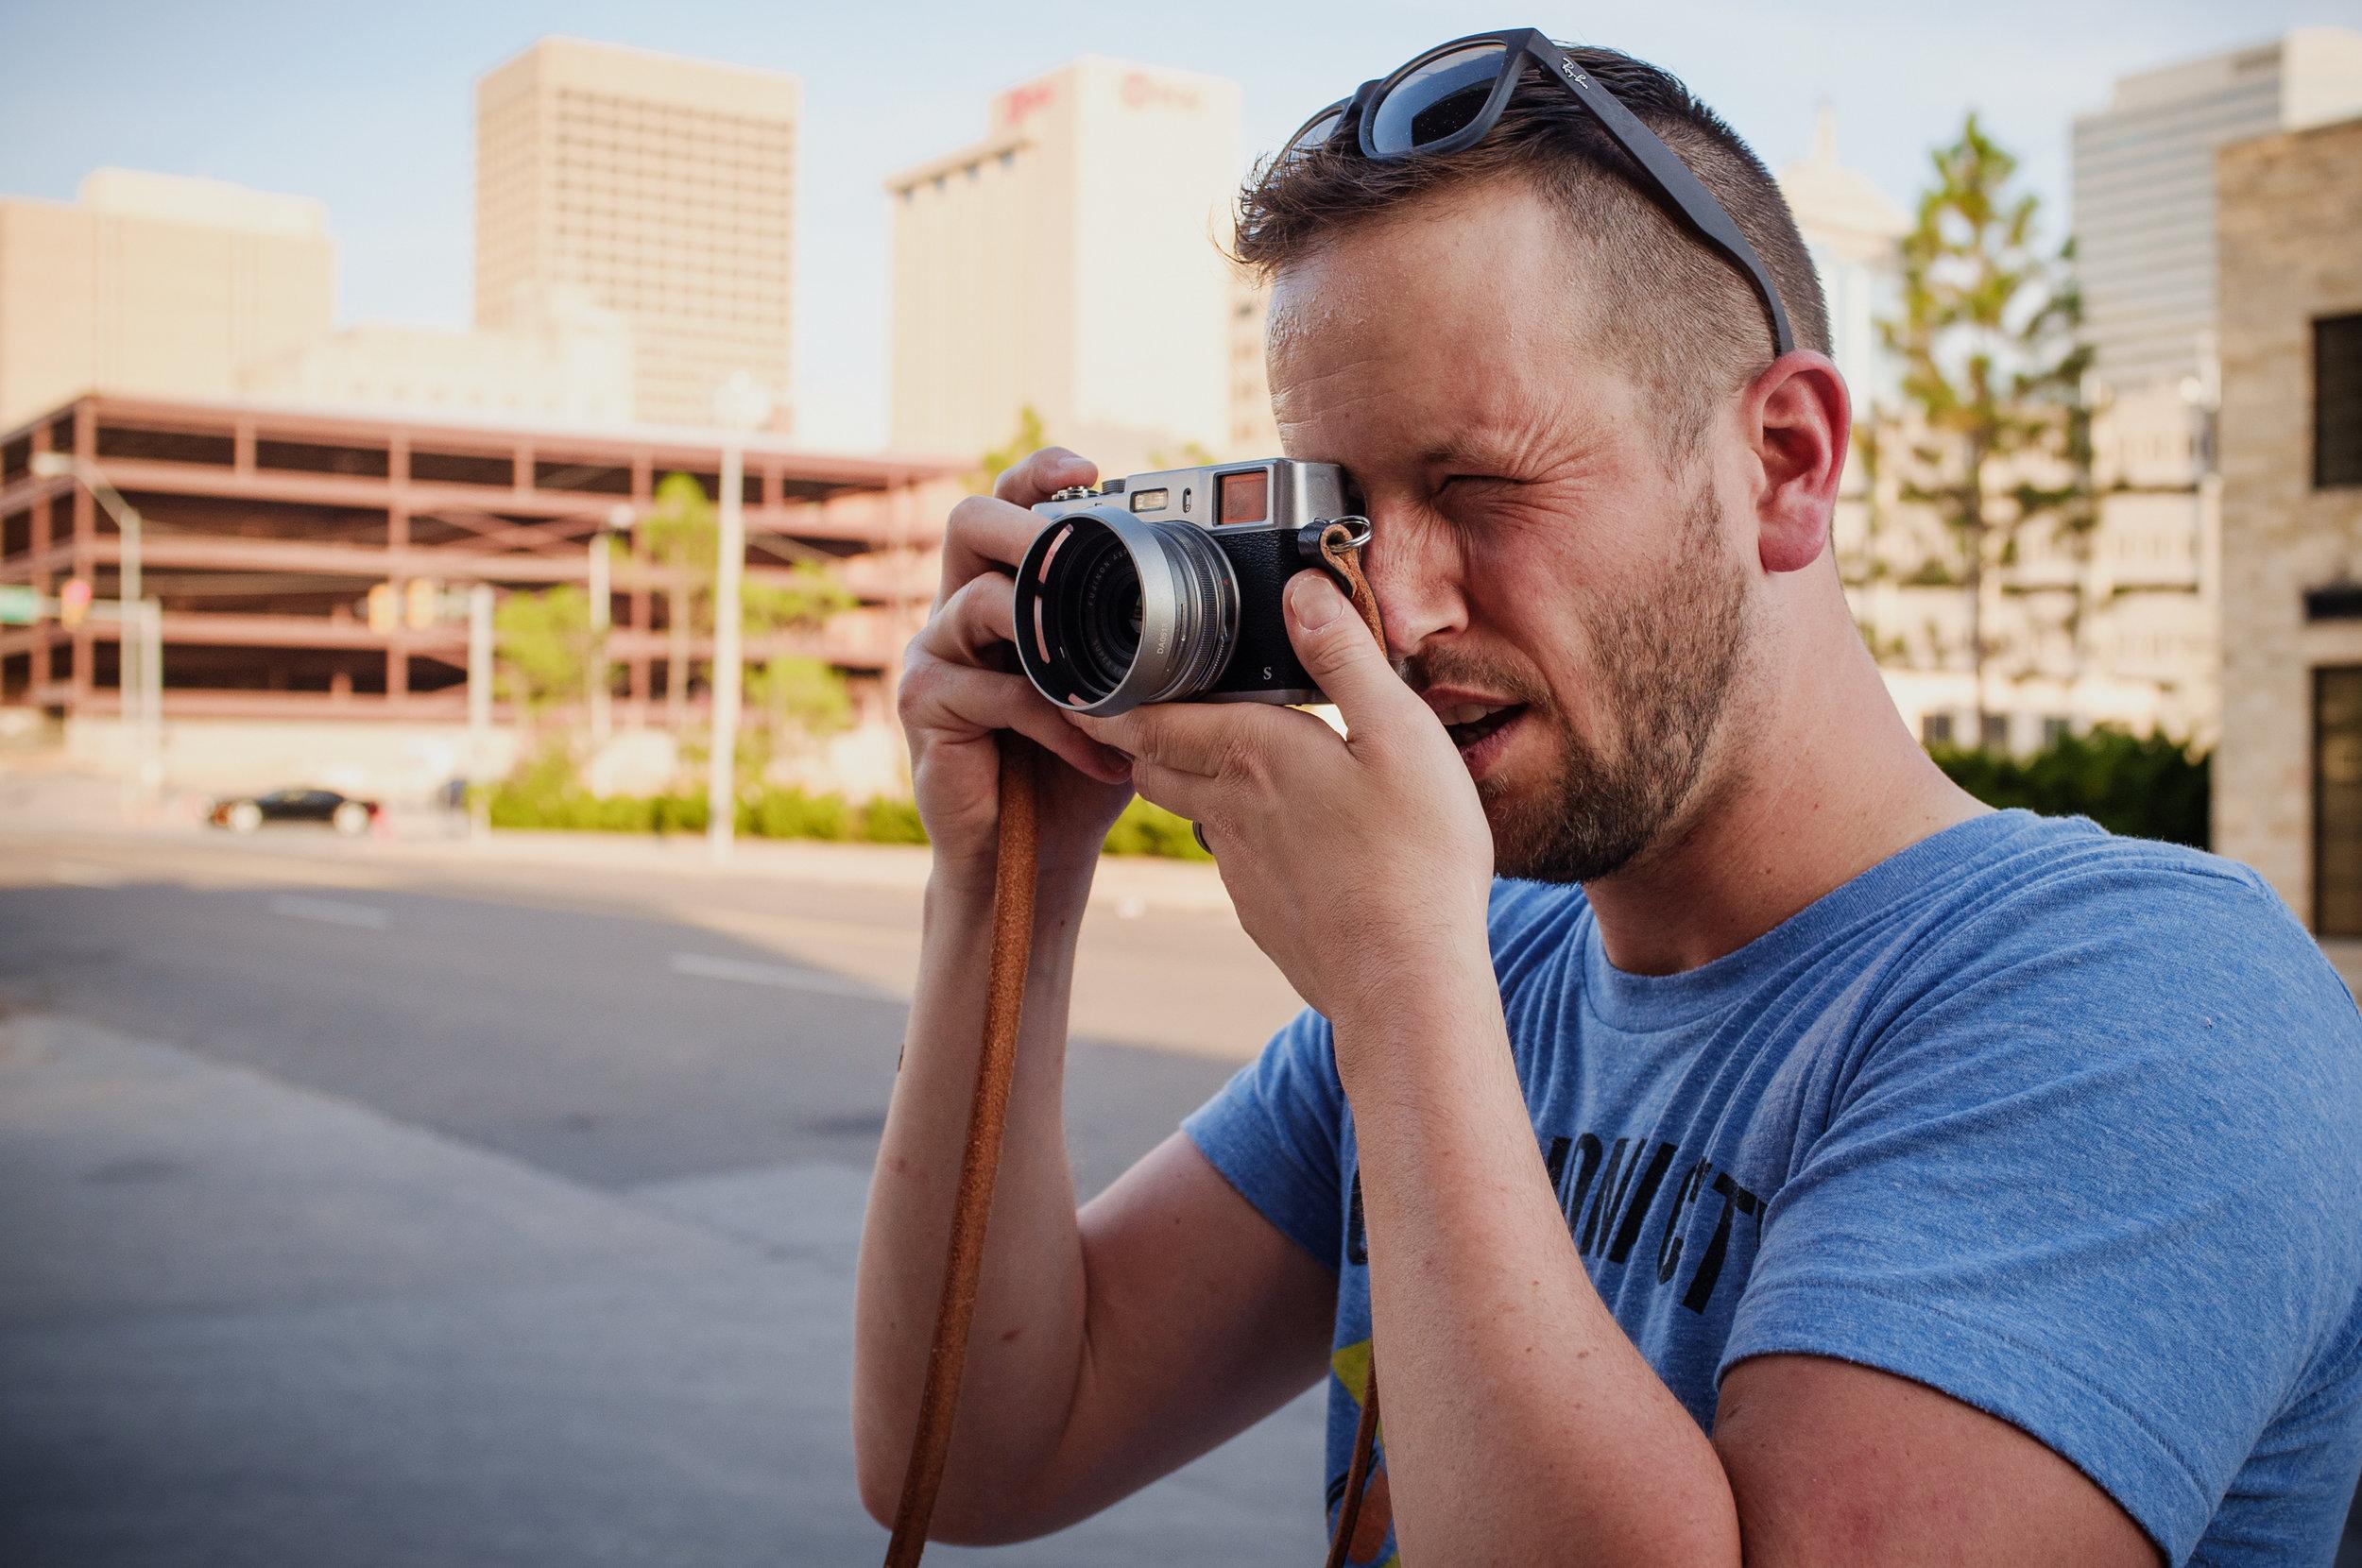 Thomas Perez working an FufjiFilm X-T100 during the ADA Camera Club PhotoWalk in OKC